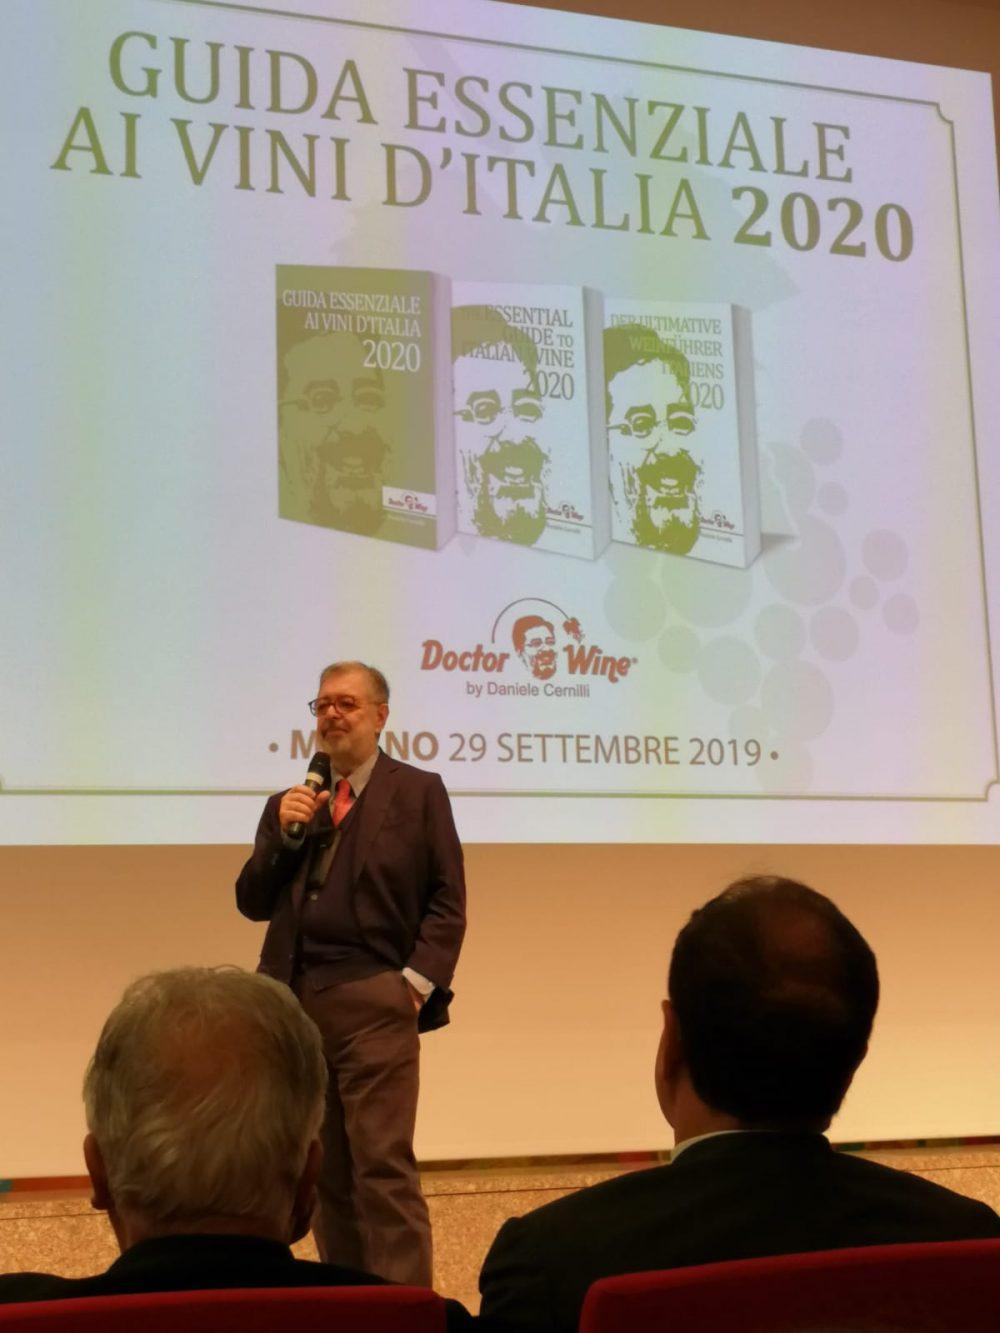 Daniele Cernilli - Presentazione Guida Essenziale ai Vini d'Italia DoctorWine